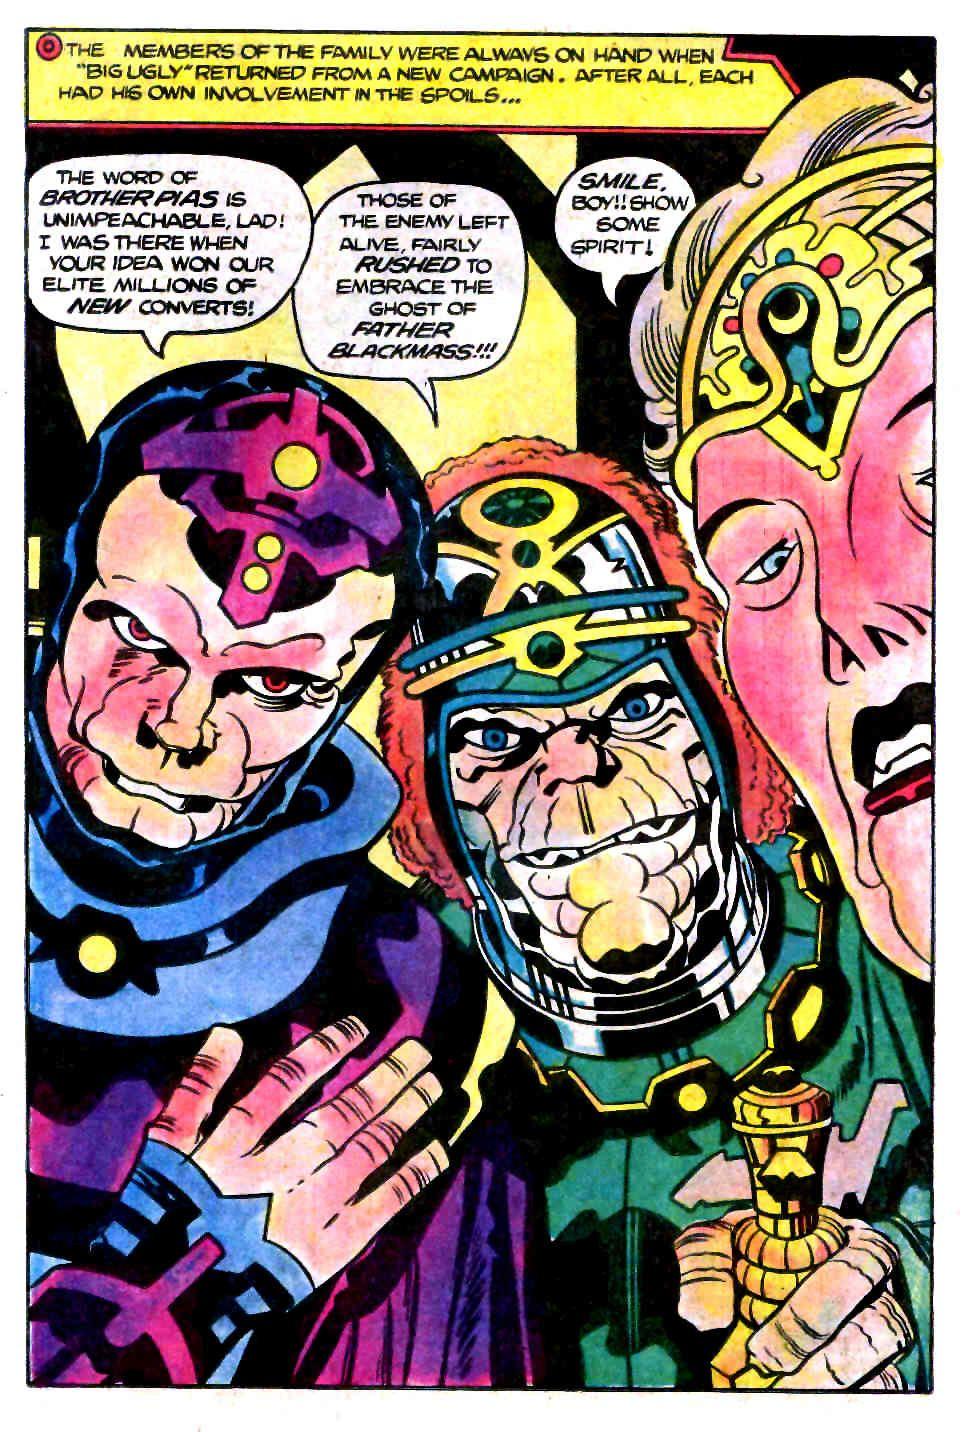 Jack Kirby Black Mass | Jack Kirby | Jack kirby, Comic books, Black mass